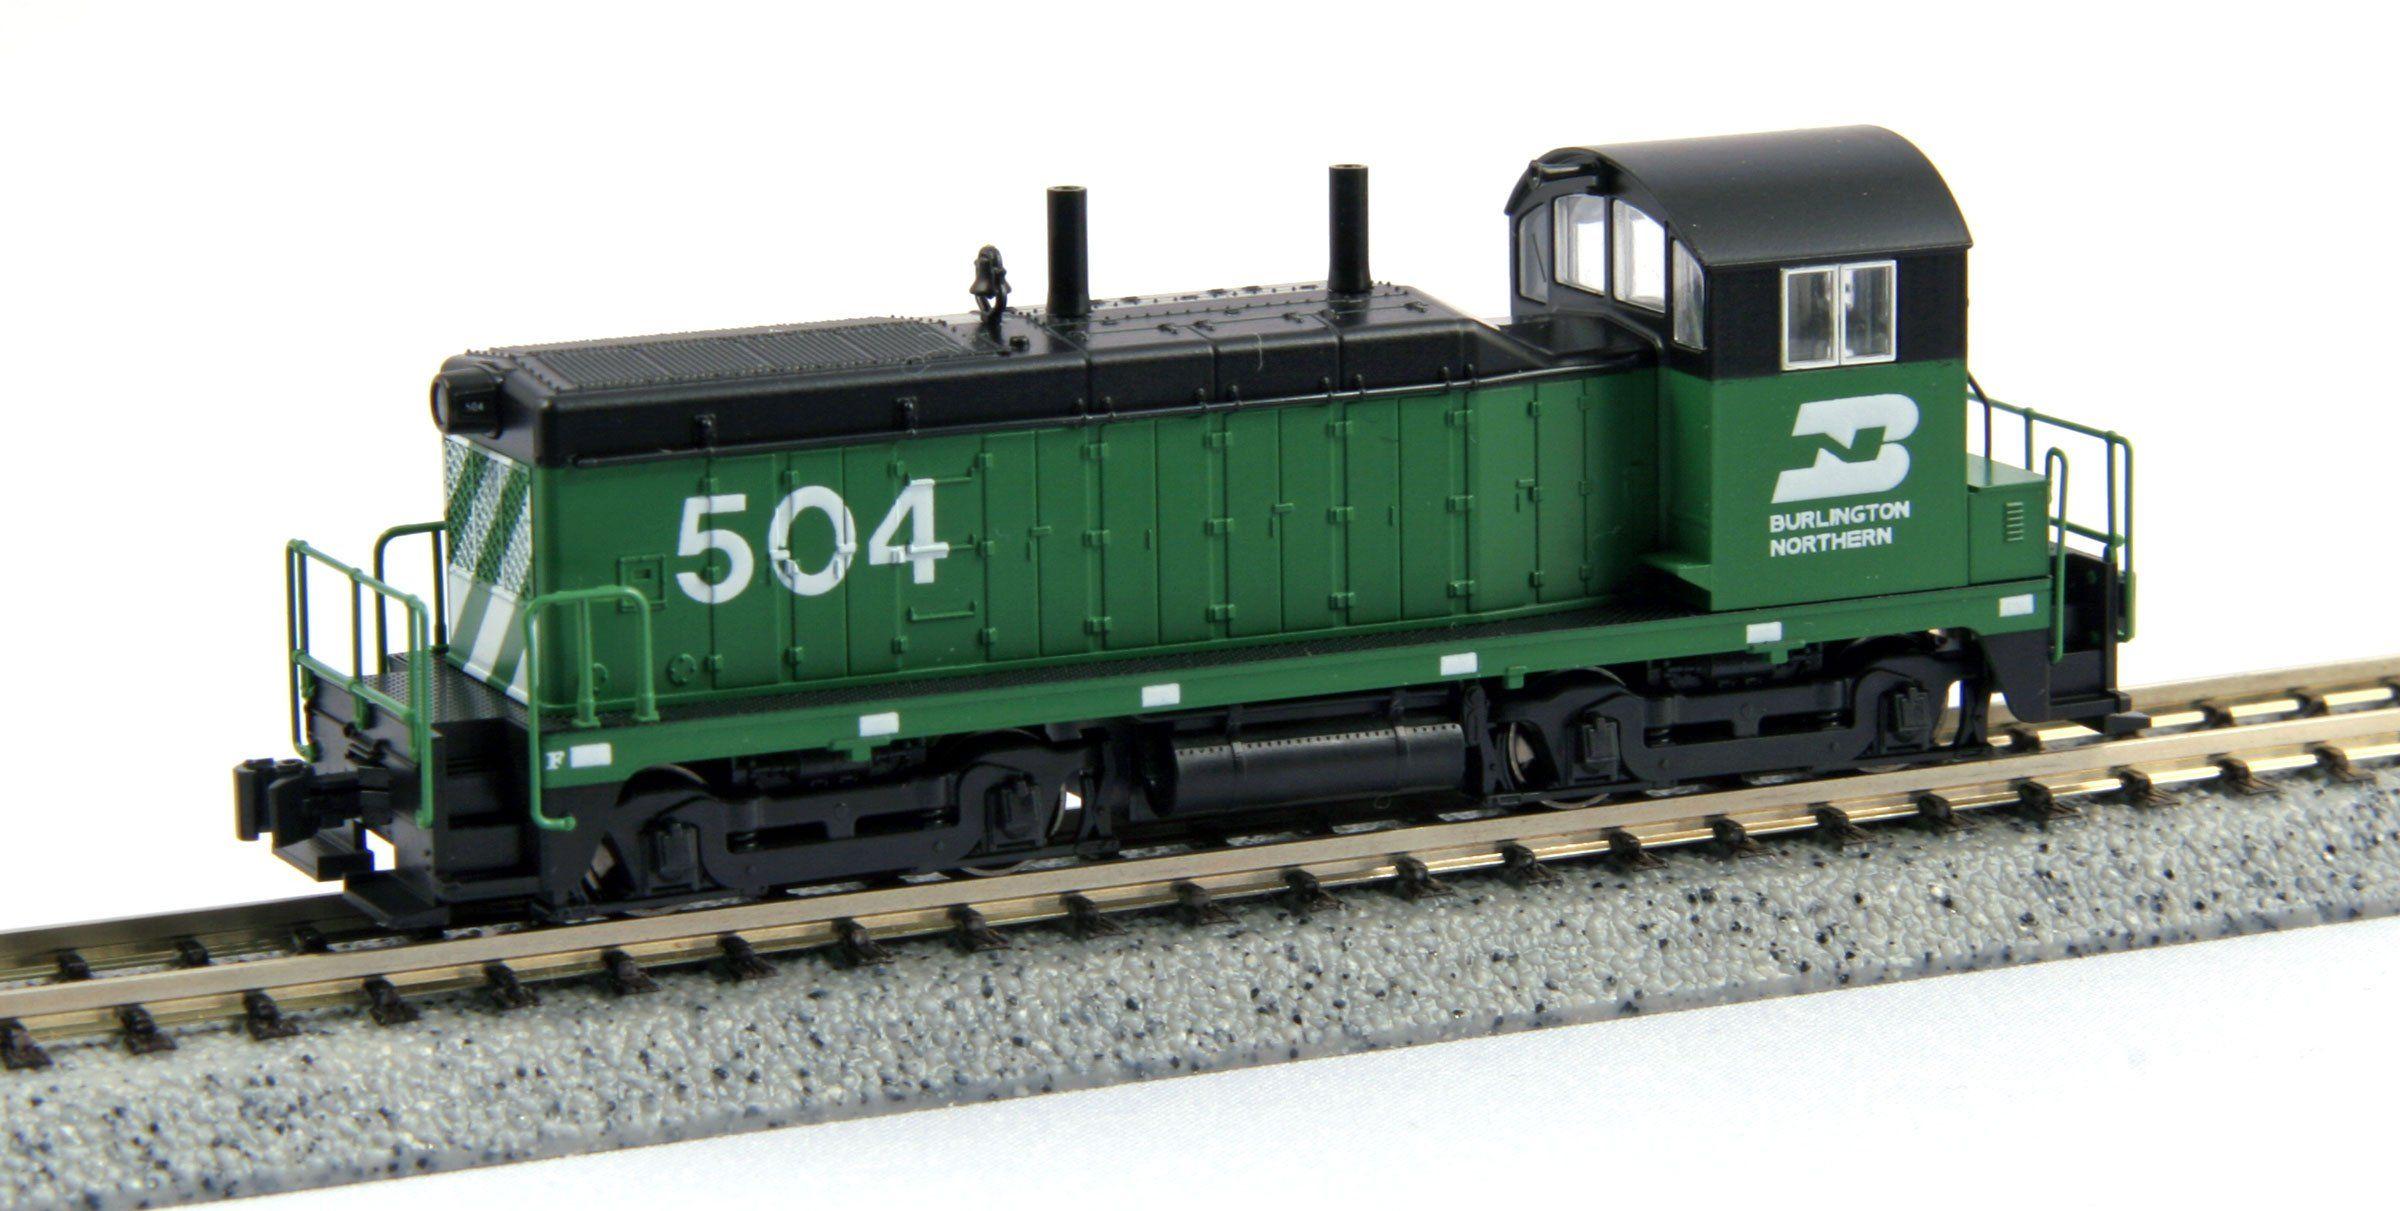 Kato 701764369 - EMD NW2 Burlington North.504 kolejka modelowa